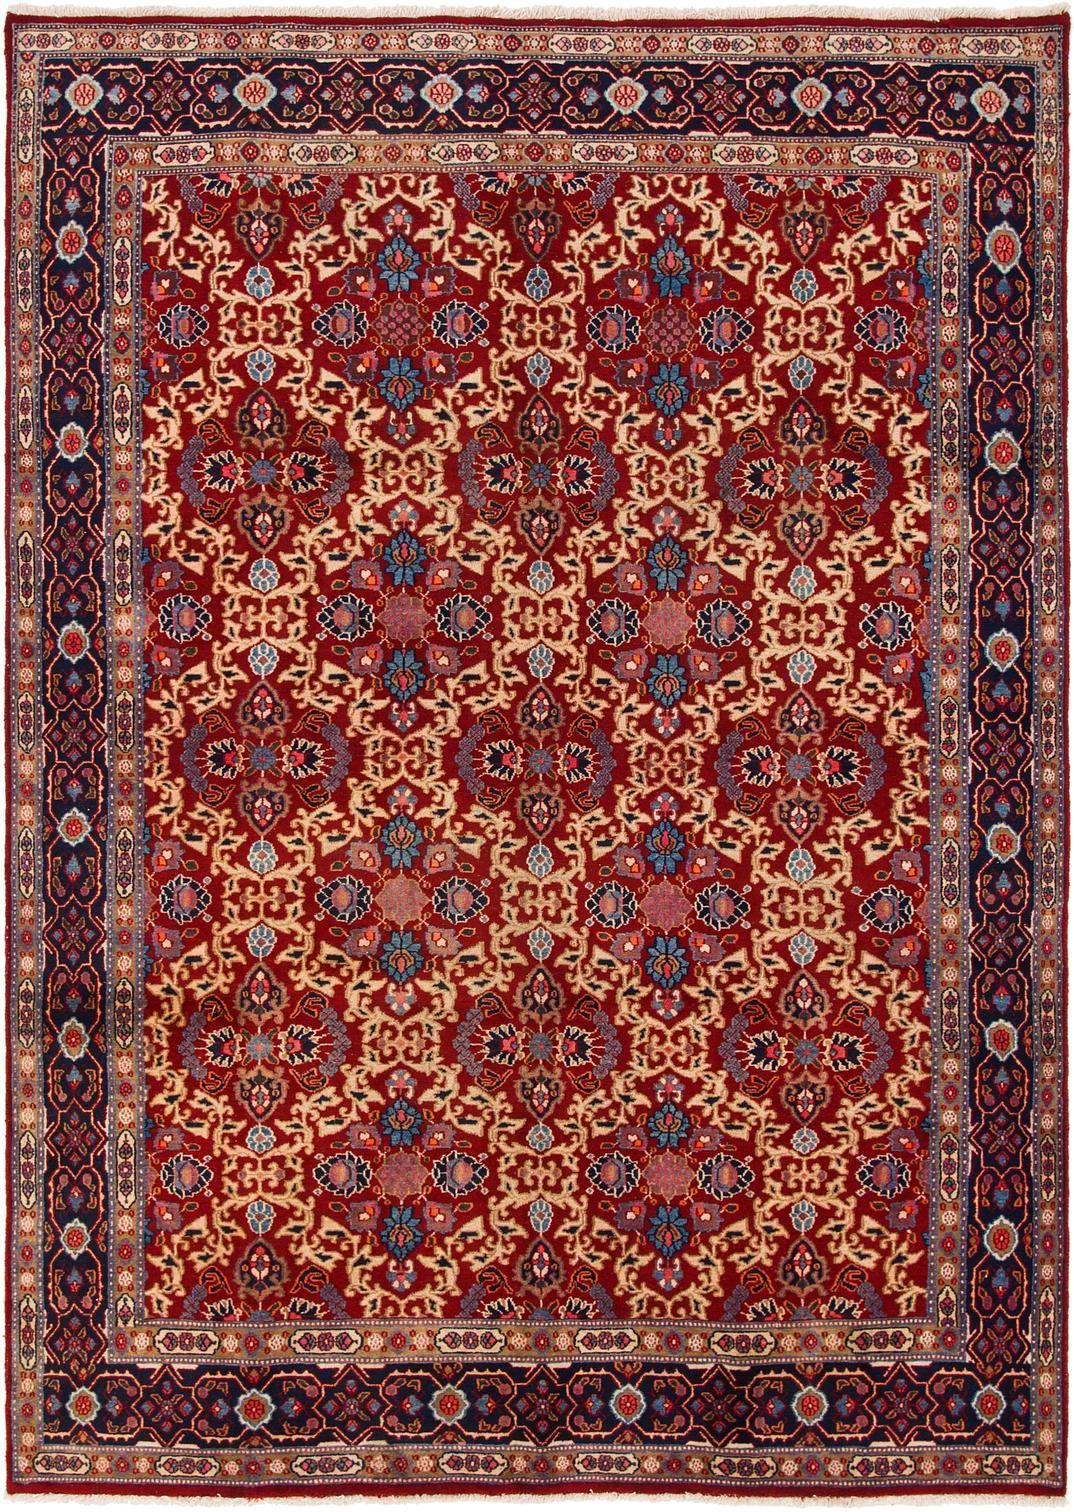 Red 6 10 X 9 9 Mood Persian Rug Persian Rugs Esalerugs Persian Rug Rugs Persian